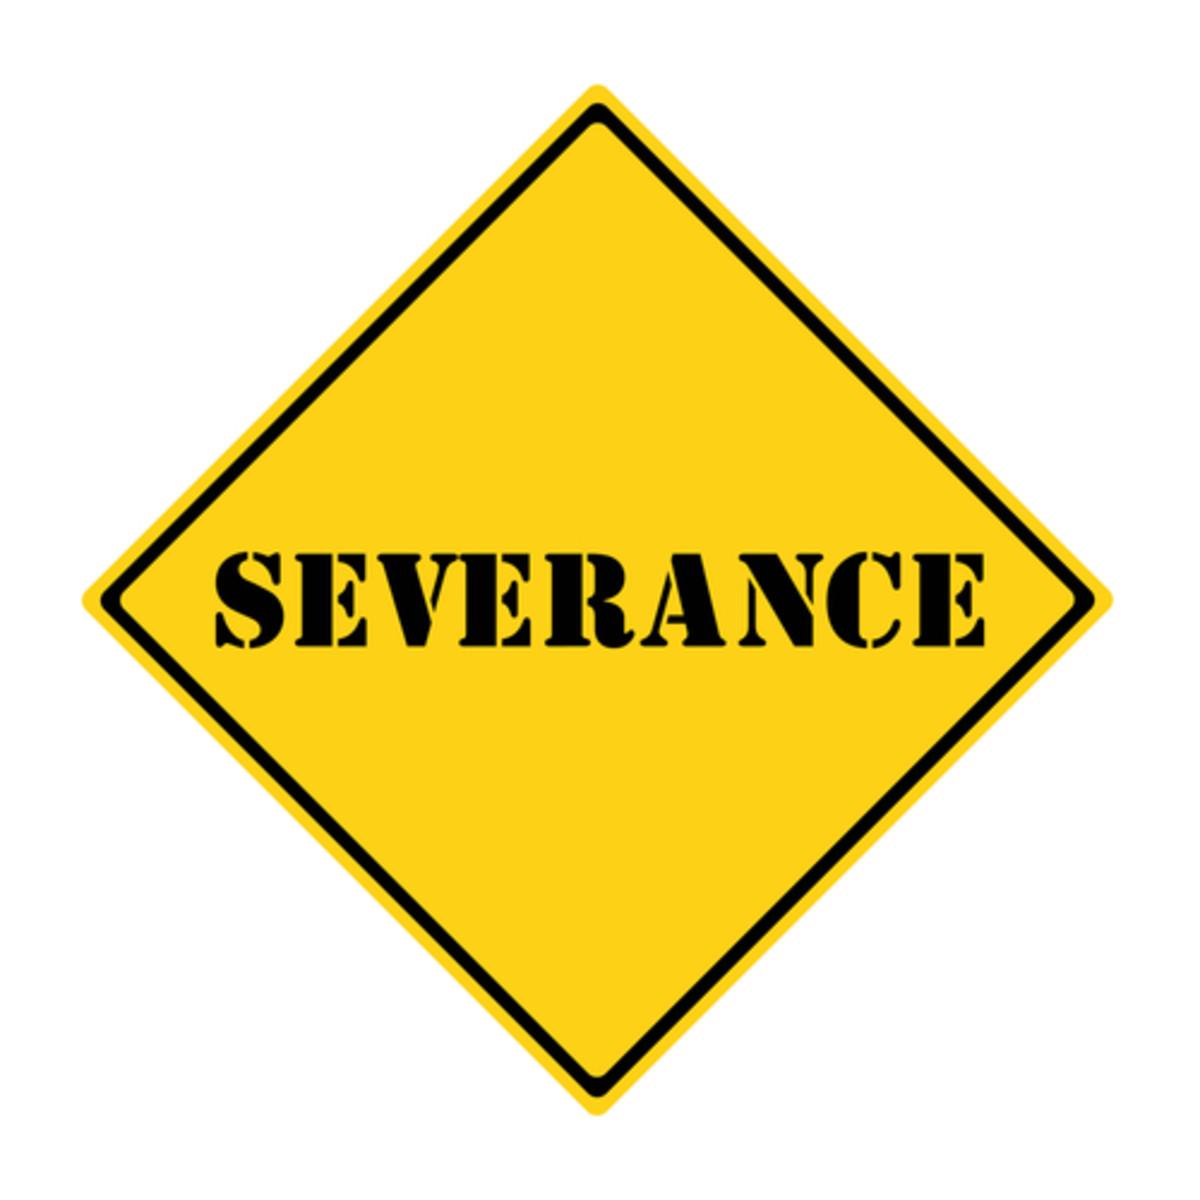 dismissals-lawful-unlawful-and-redundancy